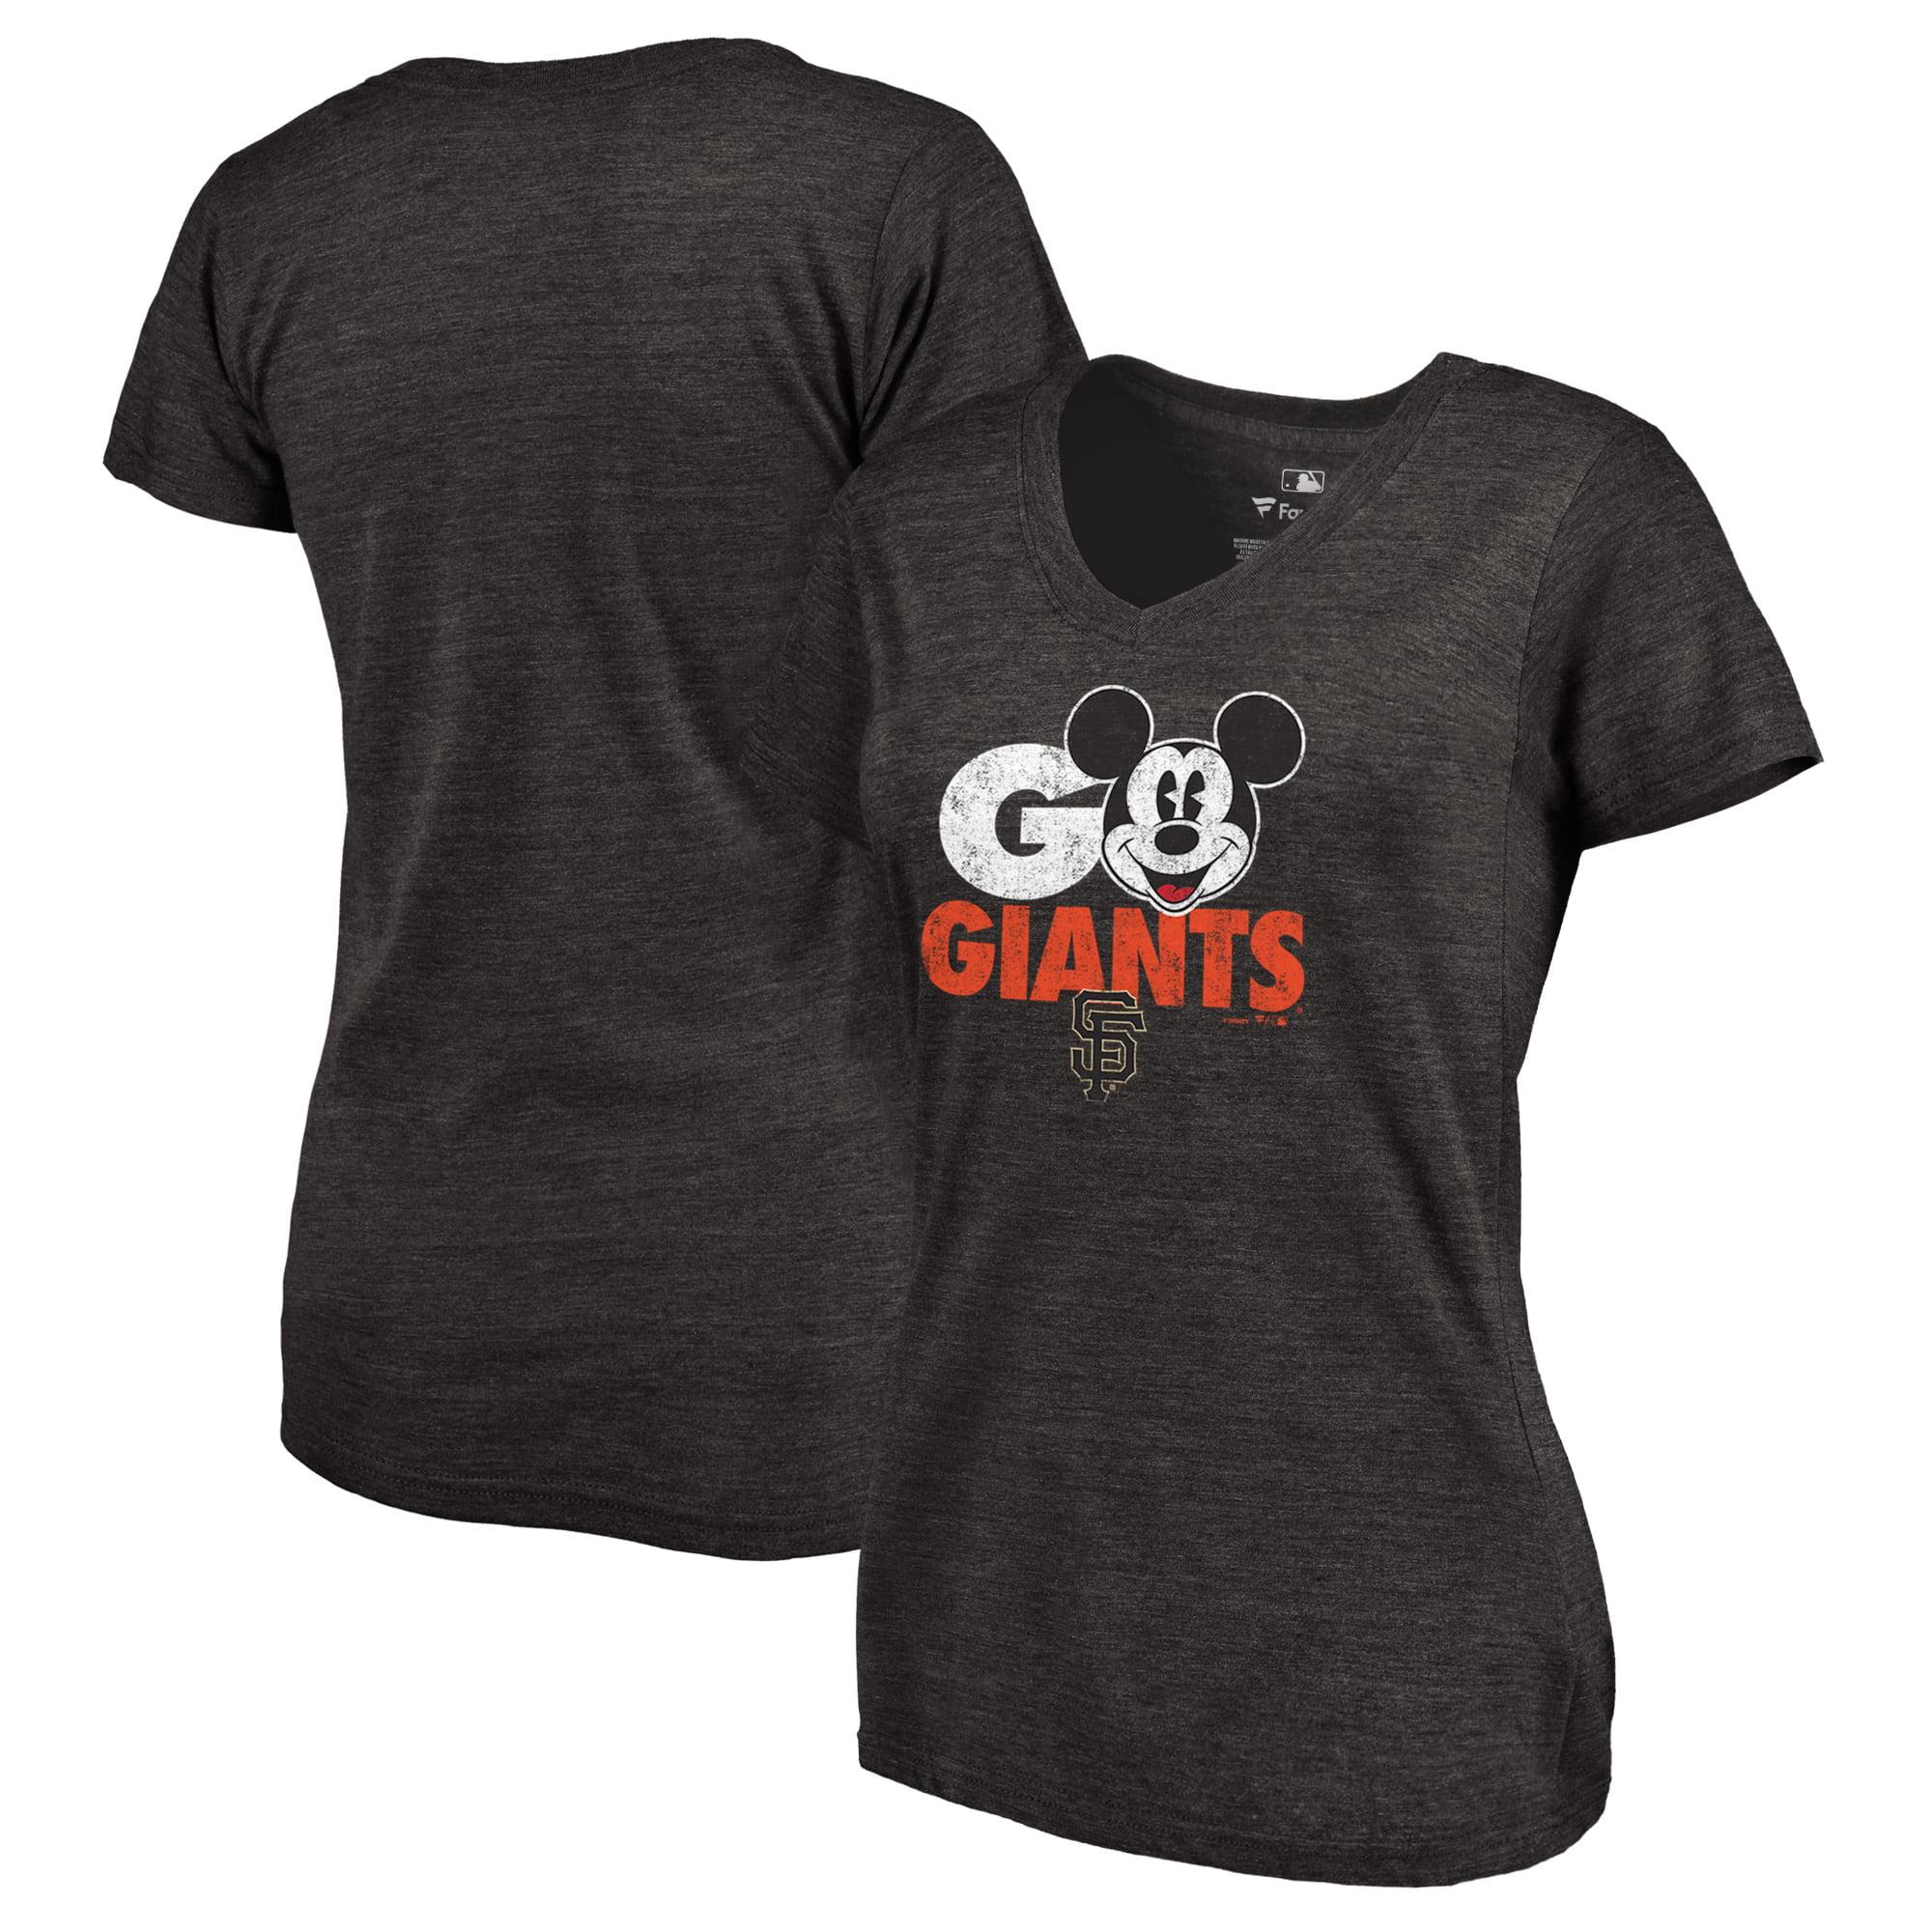 San Francisco Giants Fanatics Branded Women's Disney Rally Cry Tri-Blend V-Neck T-Shirt - Black